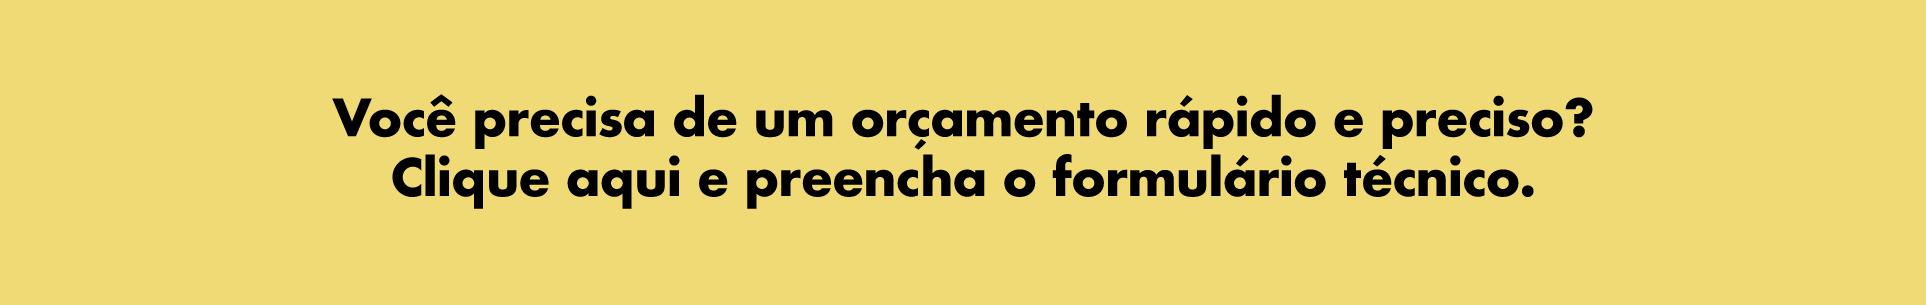 https://lidercoberturas.com.br/formulario-tecnico/